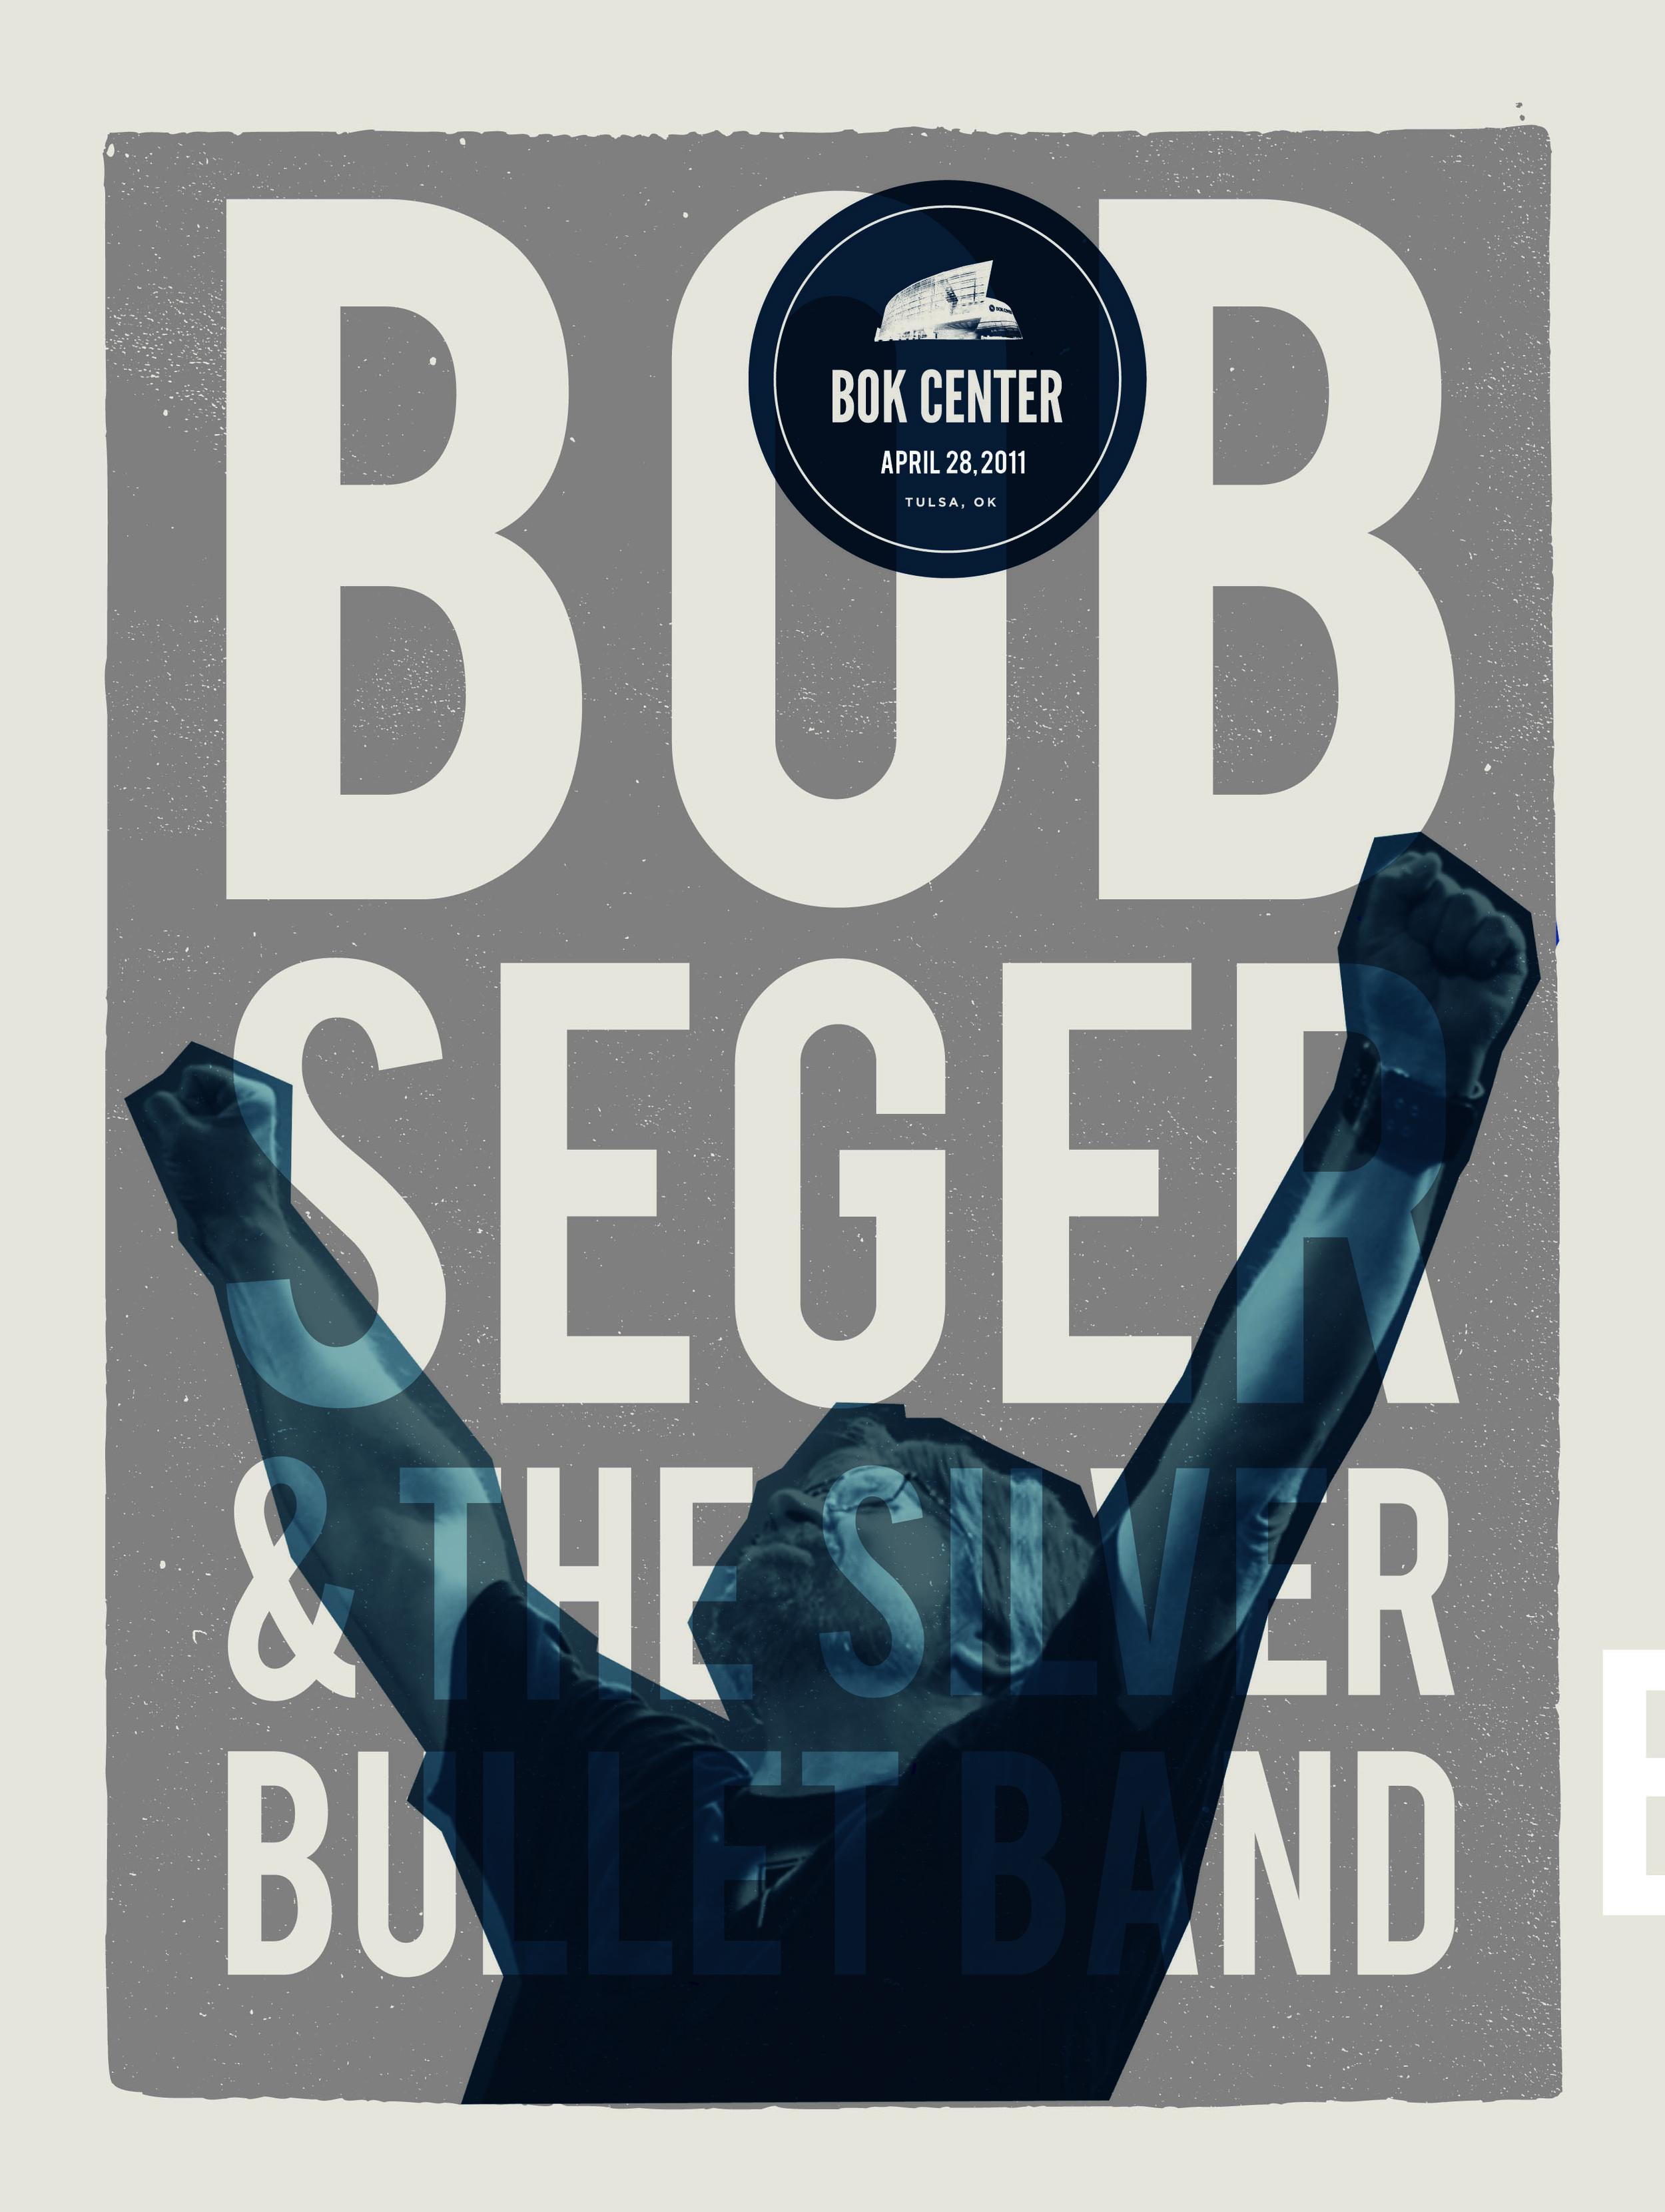 Bob Seger Poster